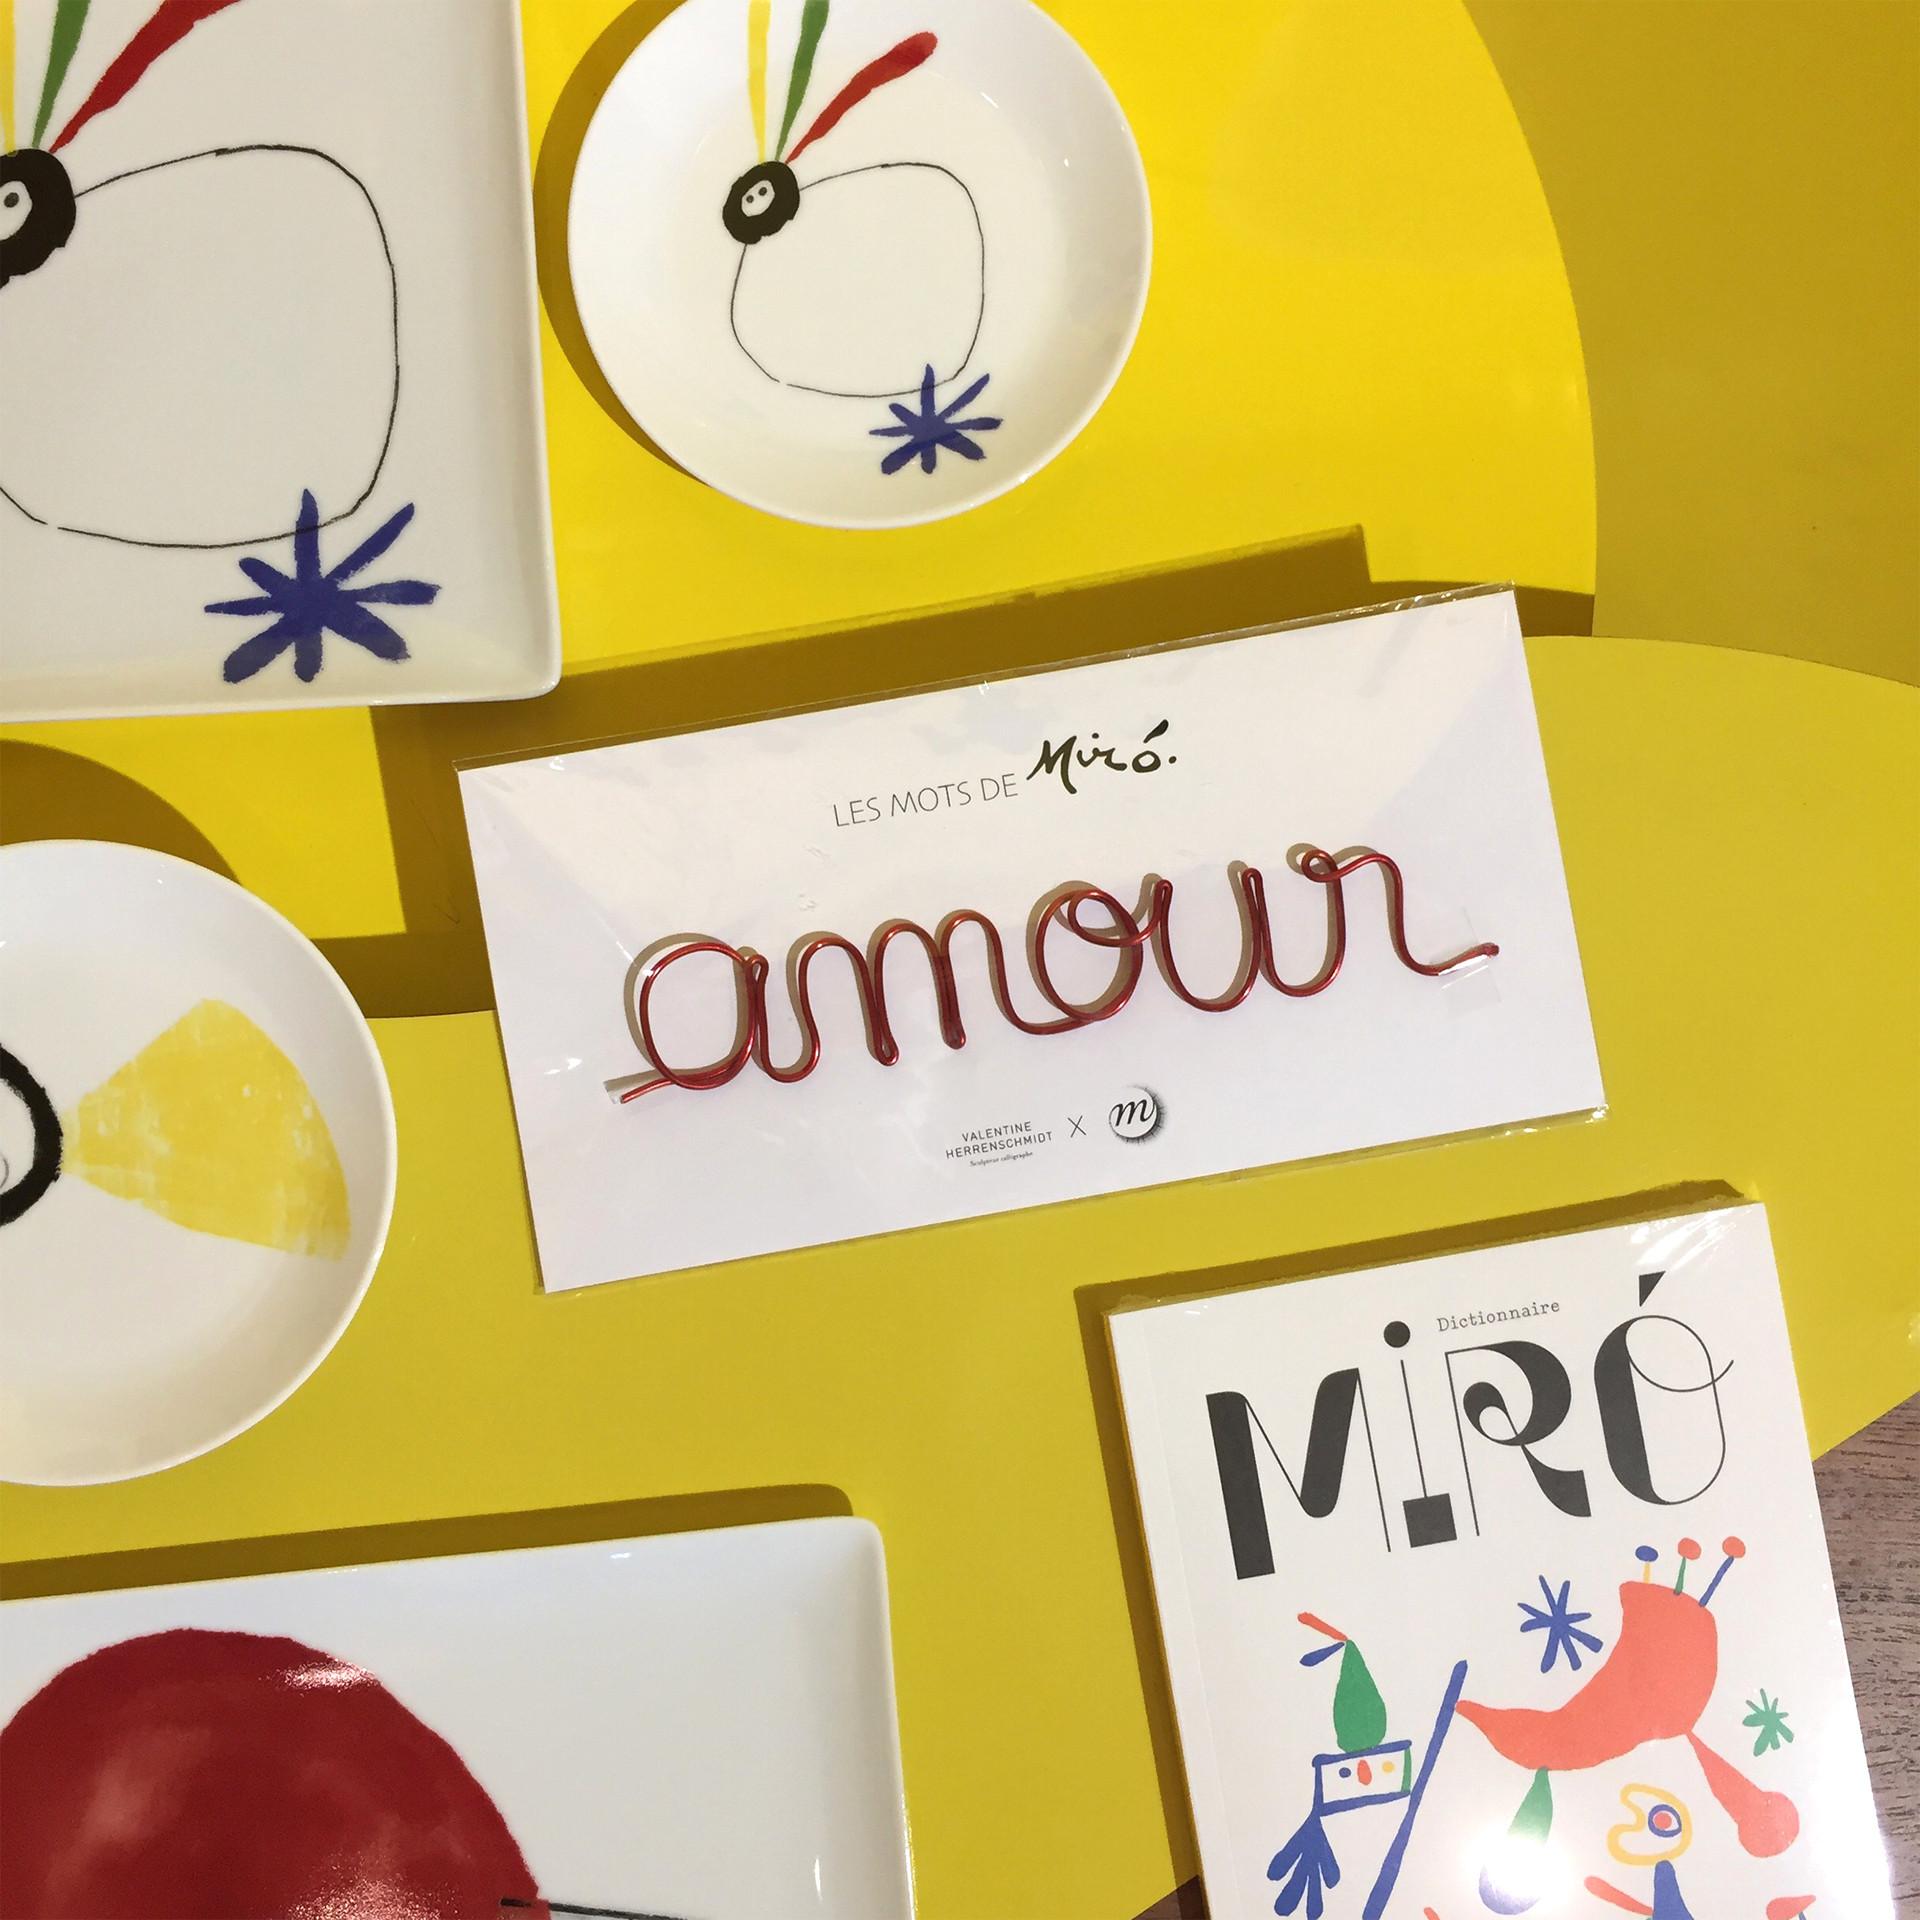 Miro-Mot-amour-boutique.jpg